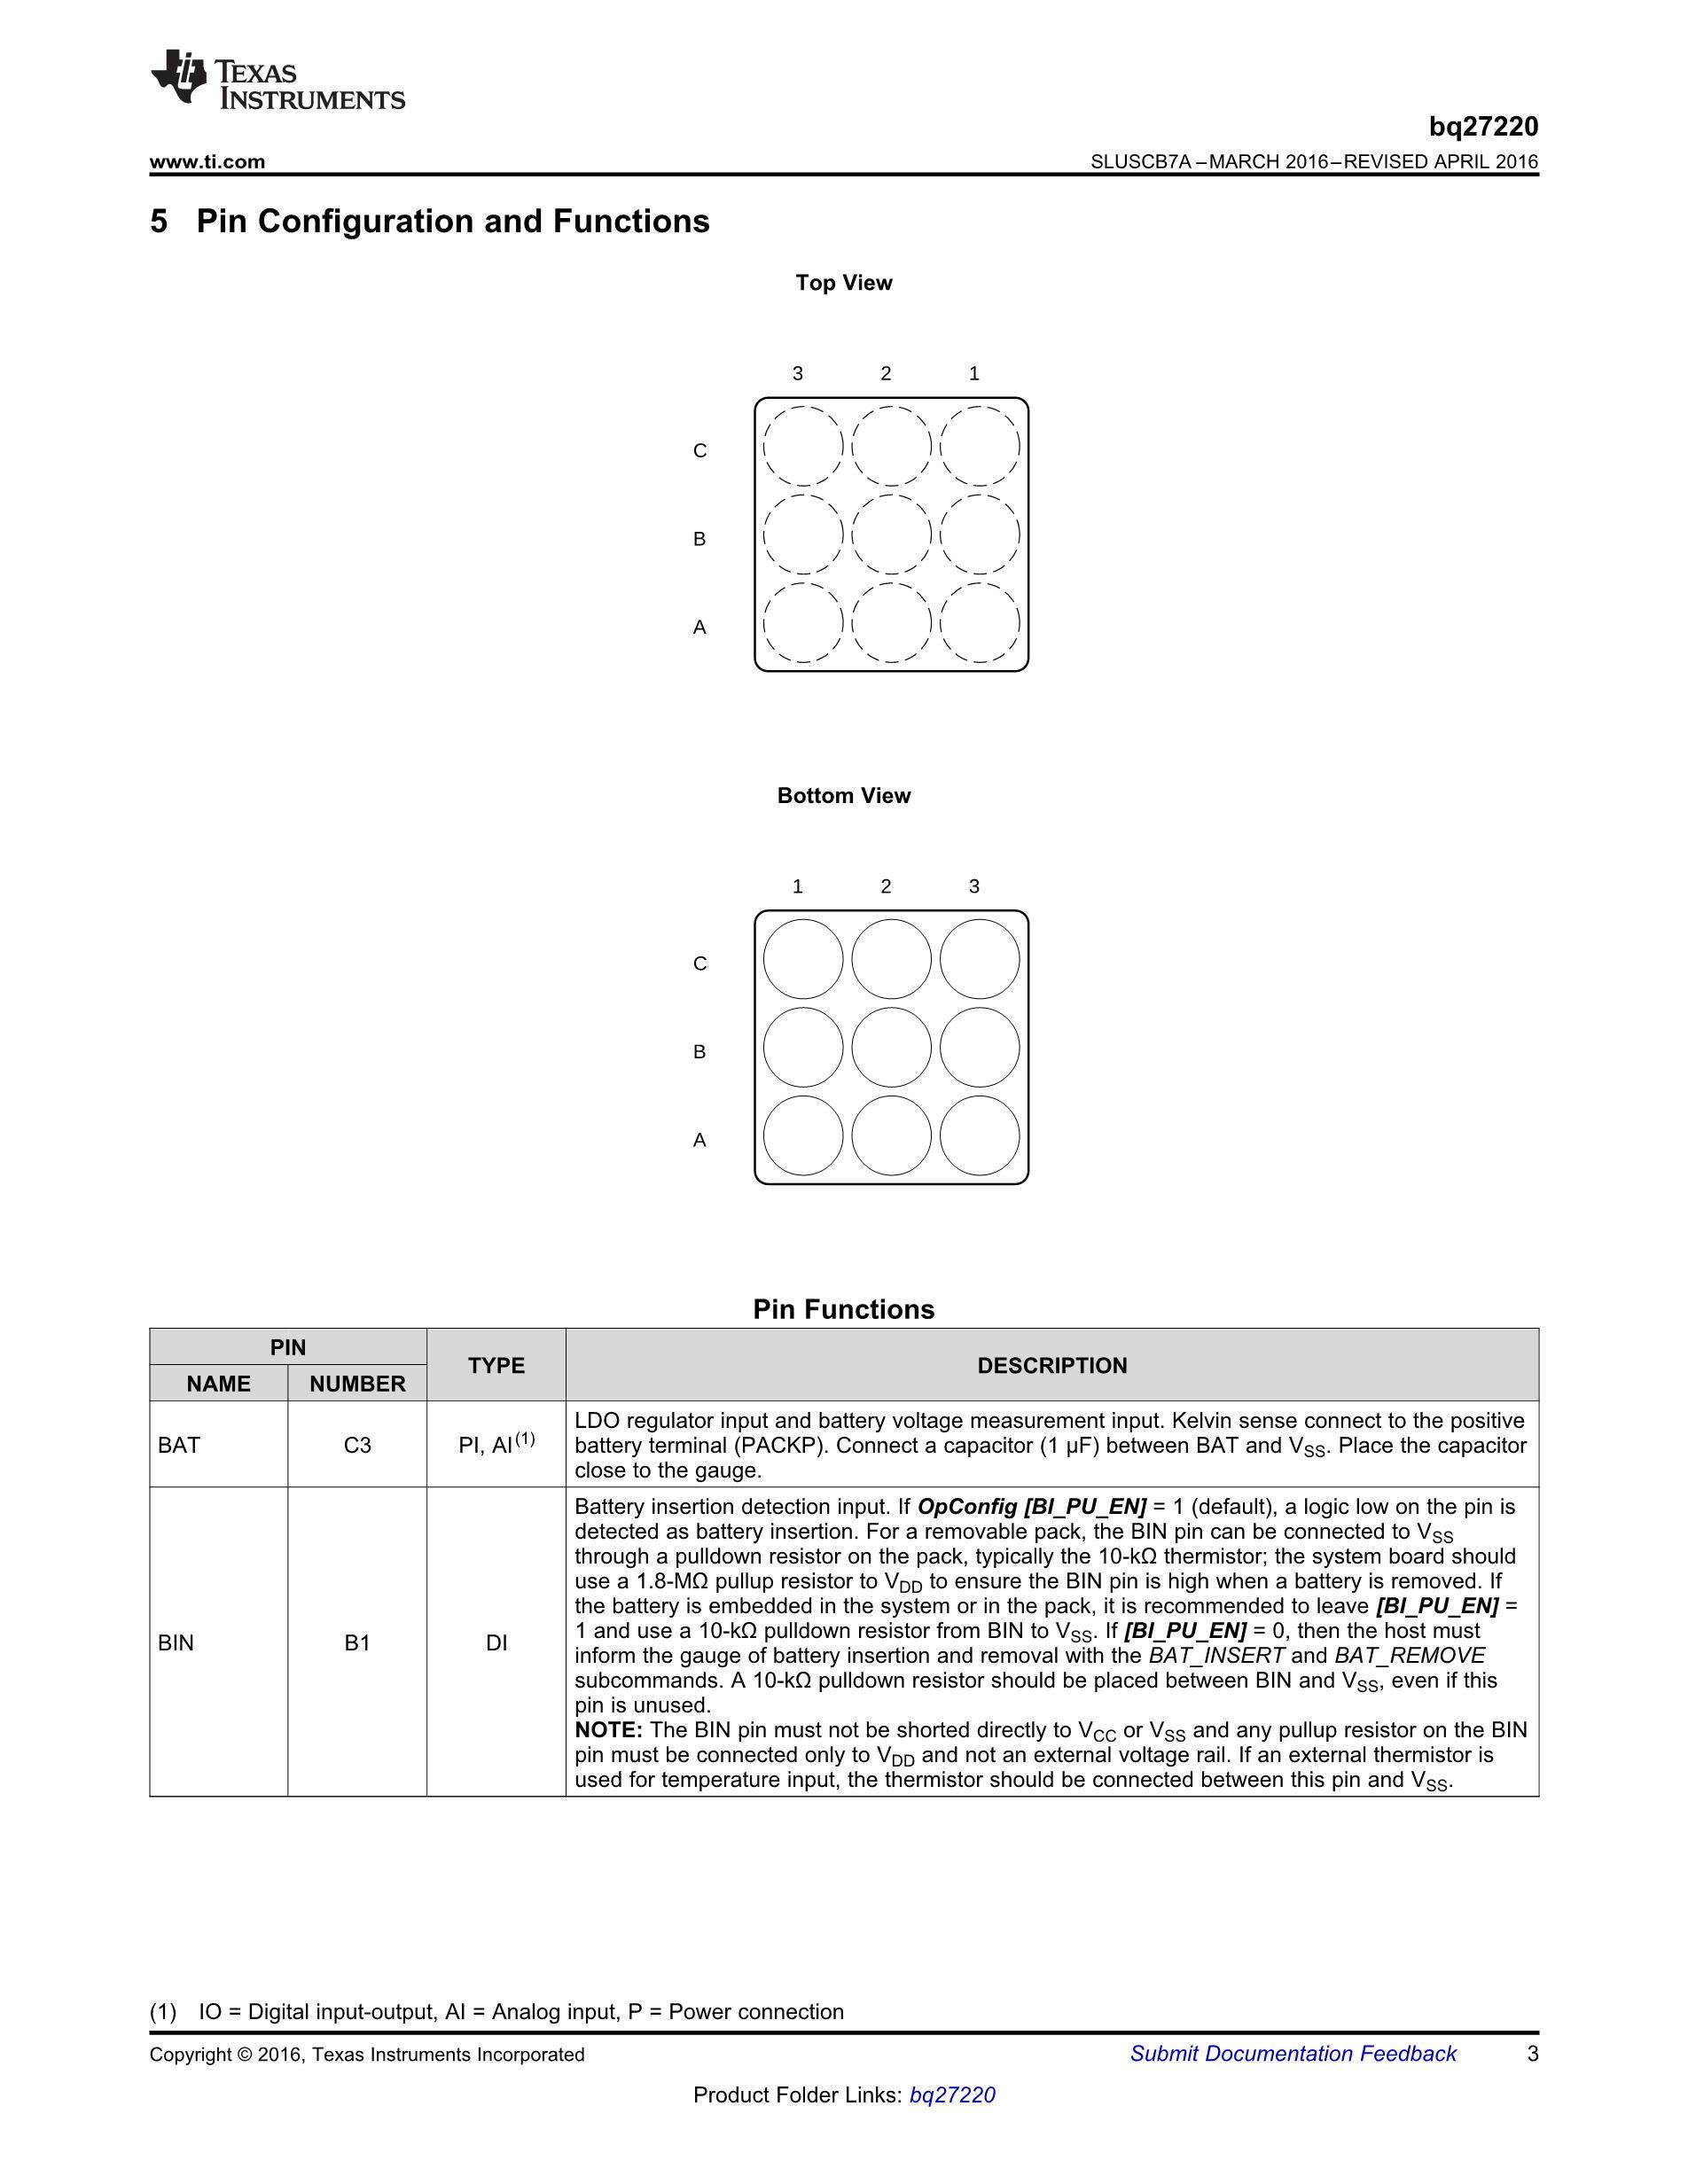 BQ27426YZFR's pdf picture 3